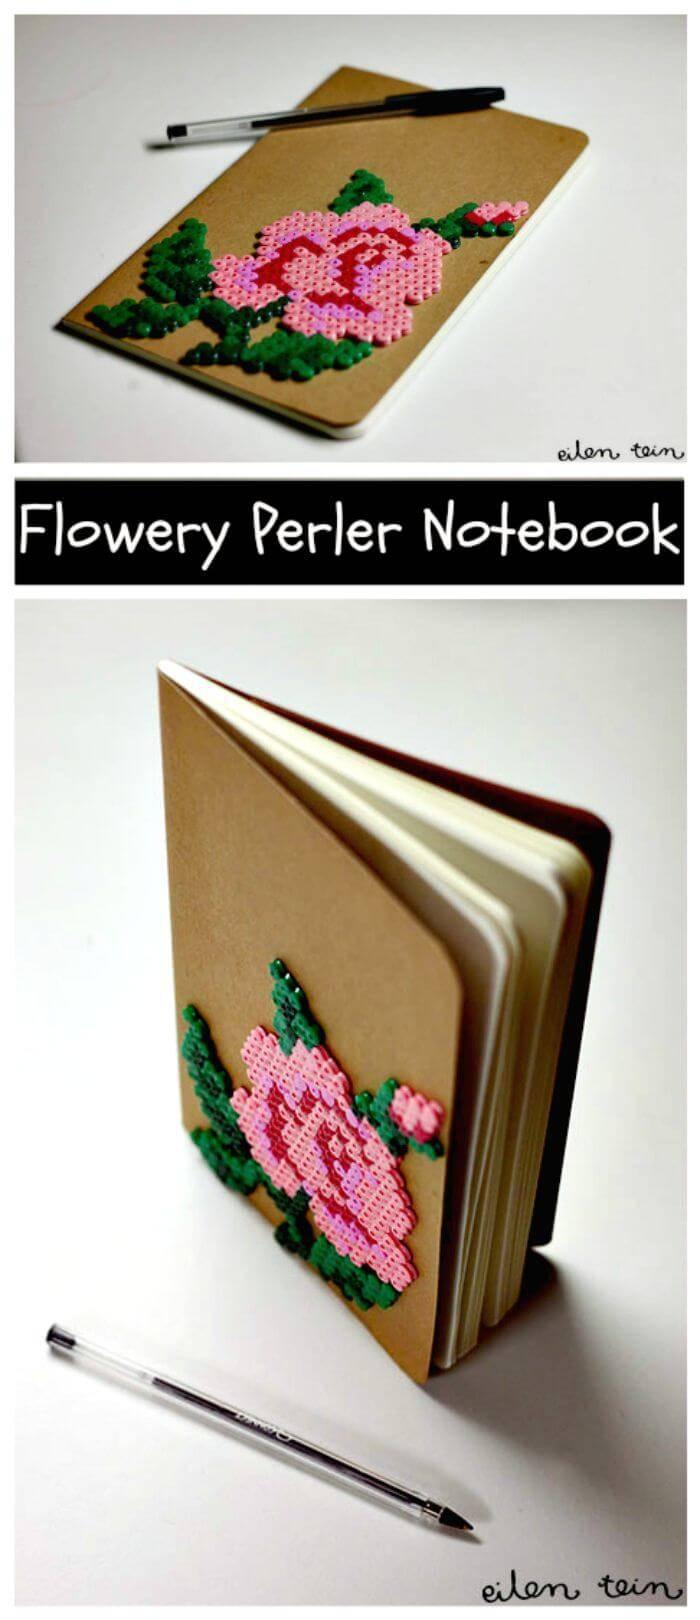 Flowery Perler Notebook